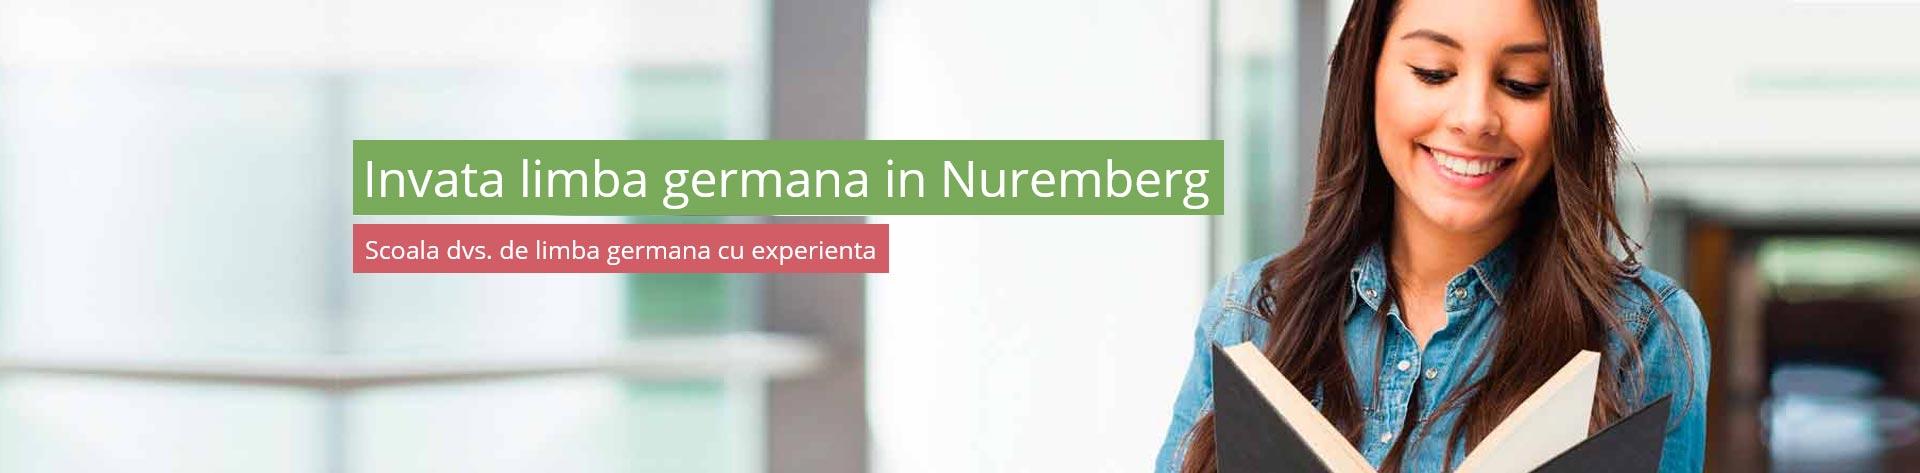 Invata limba germana in Nuremberg